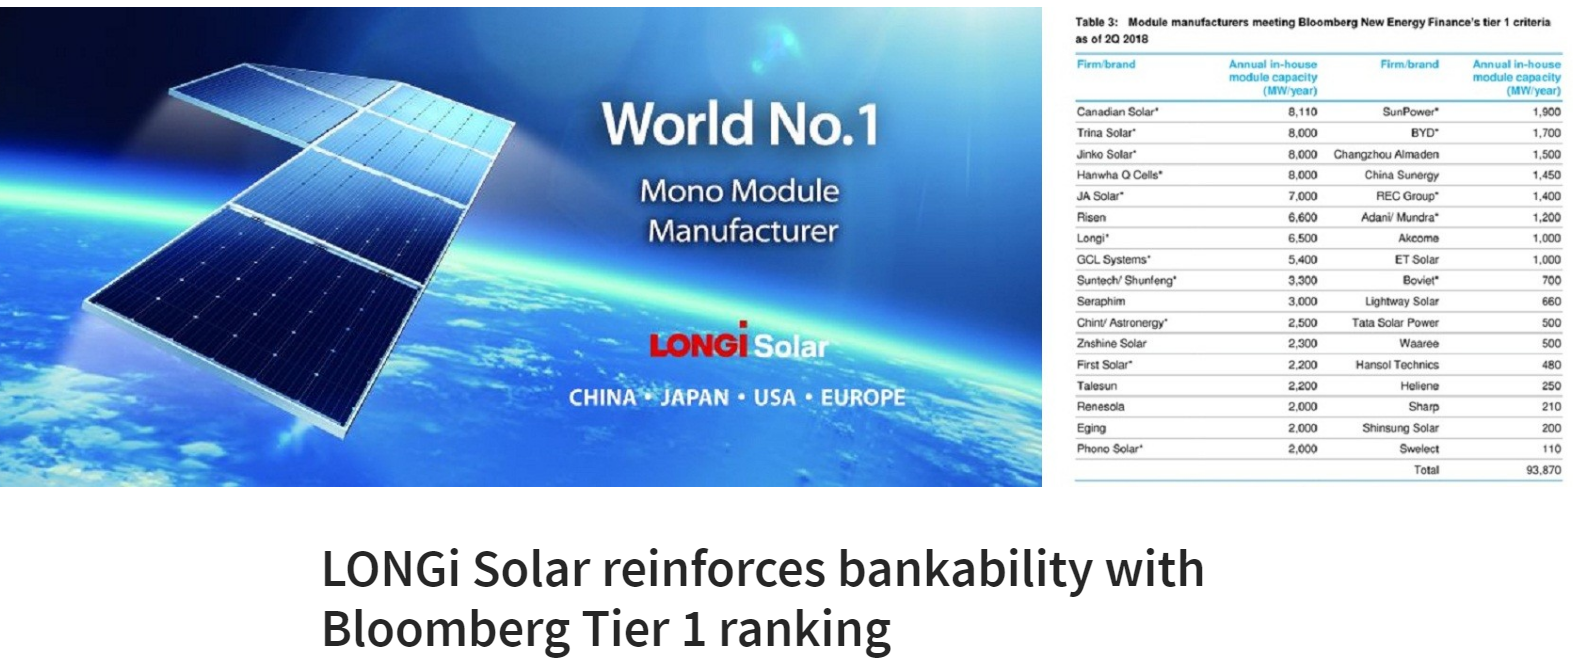 LONGi Solar reinforces bankability